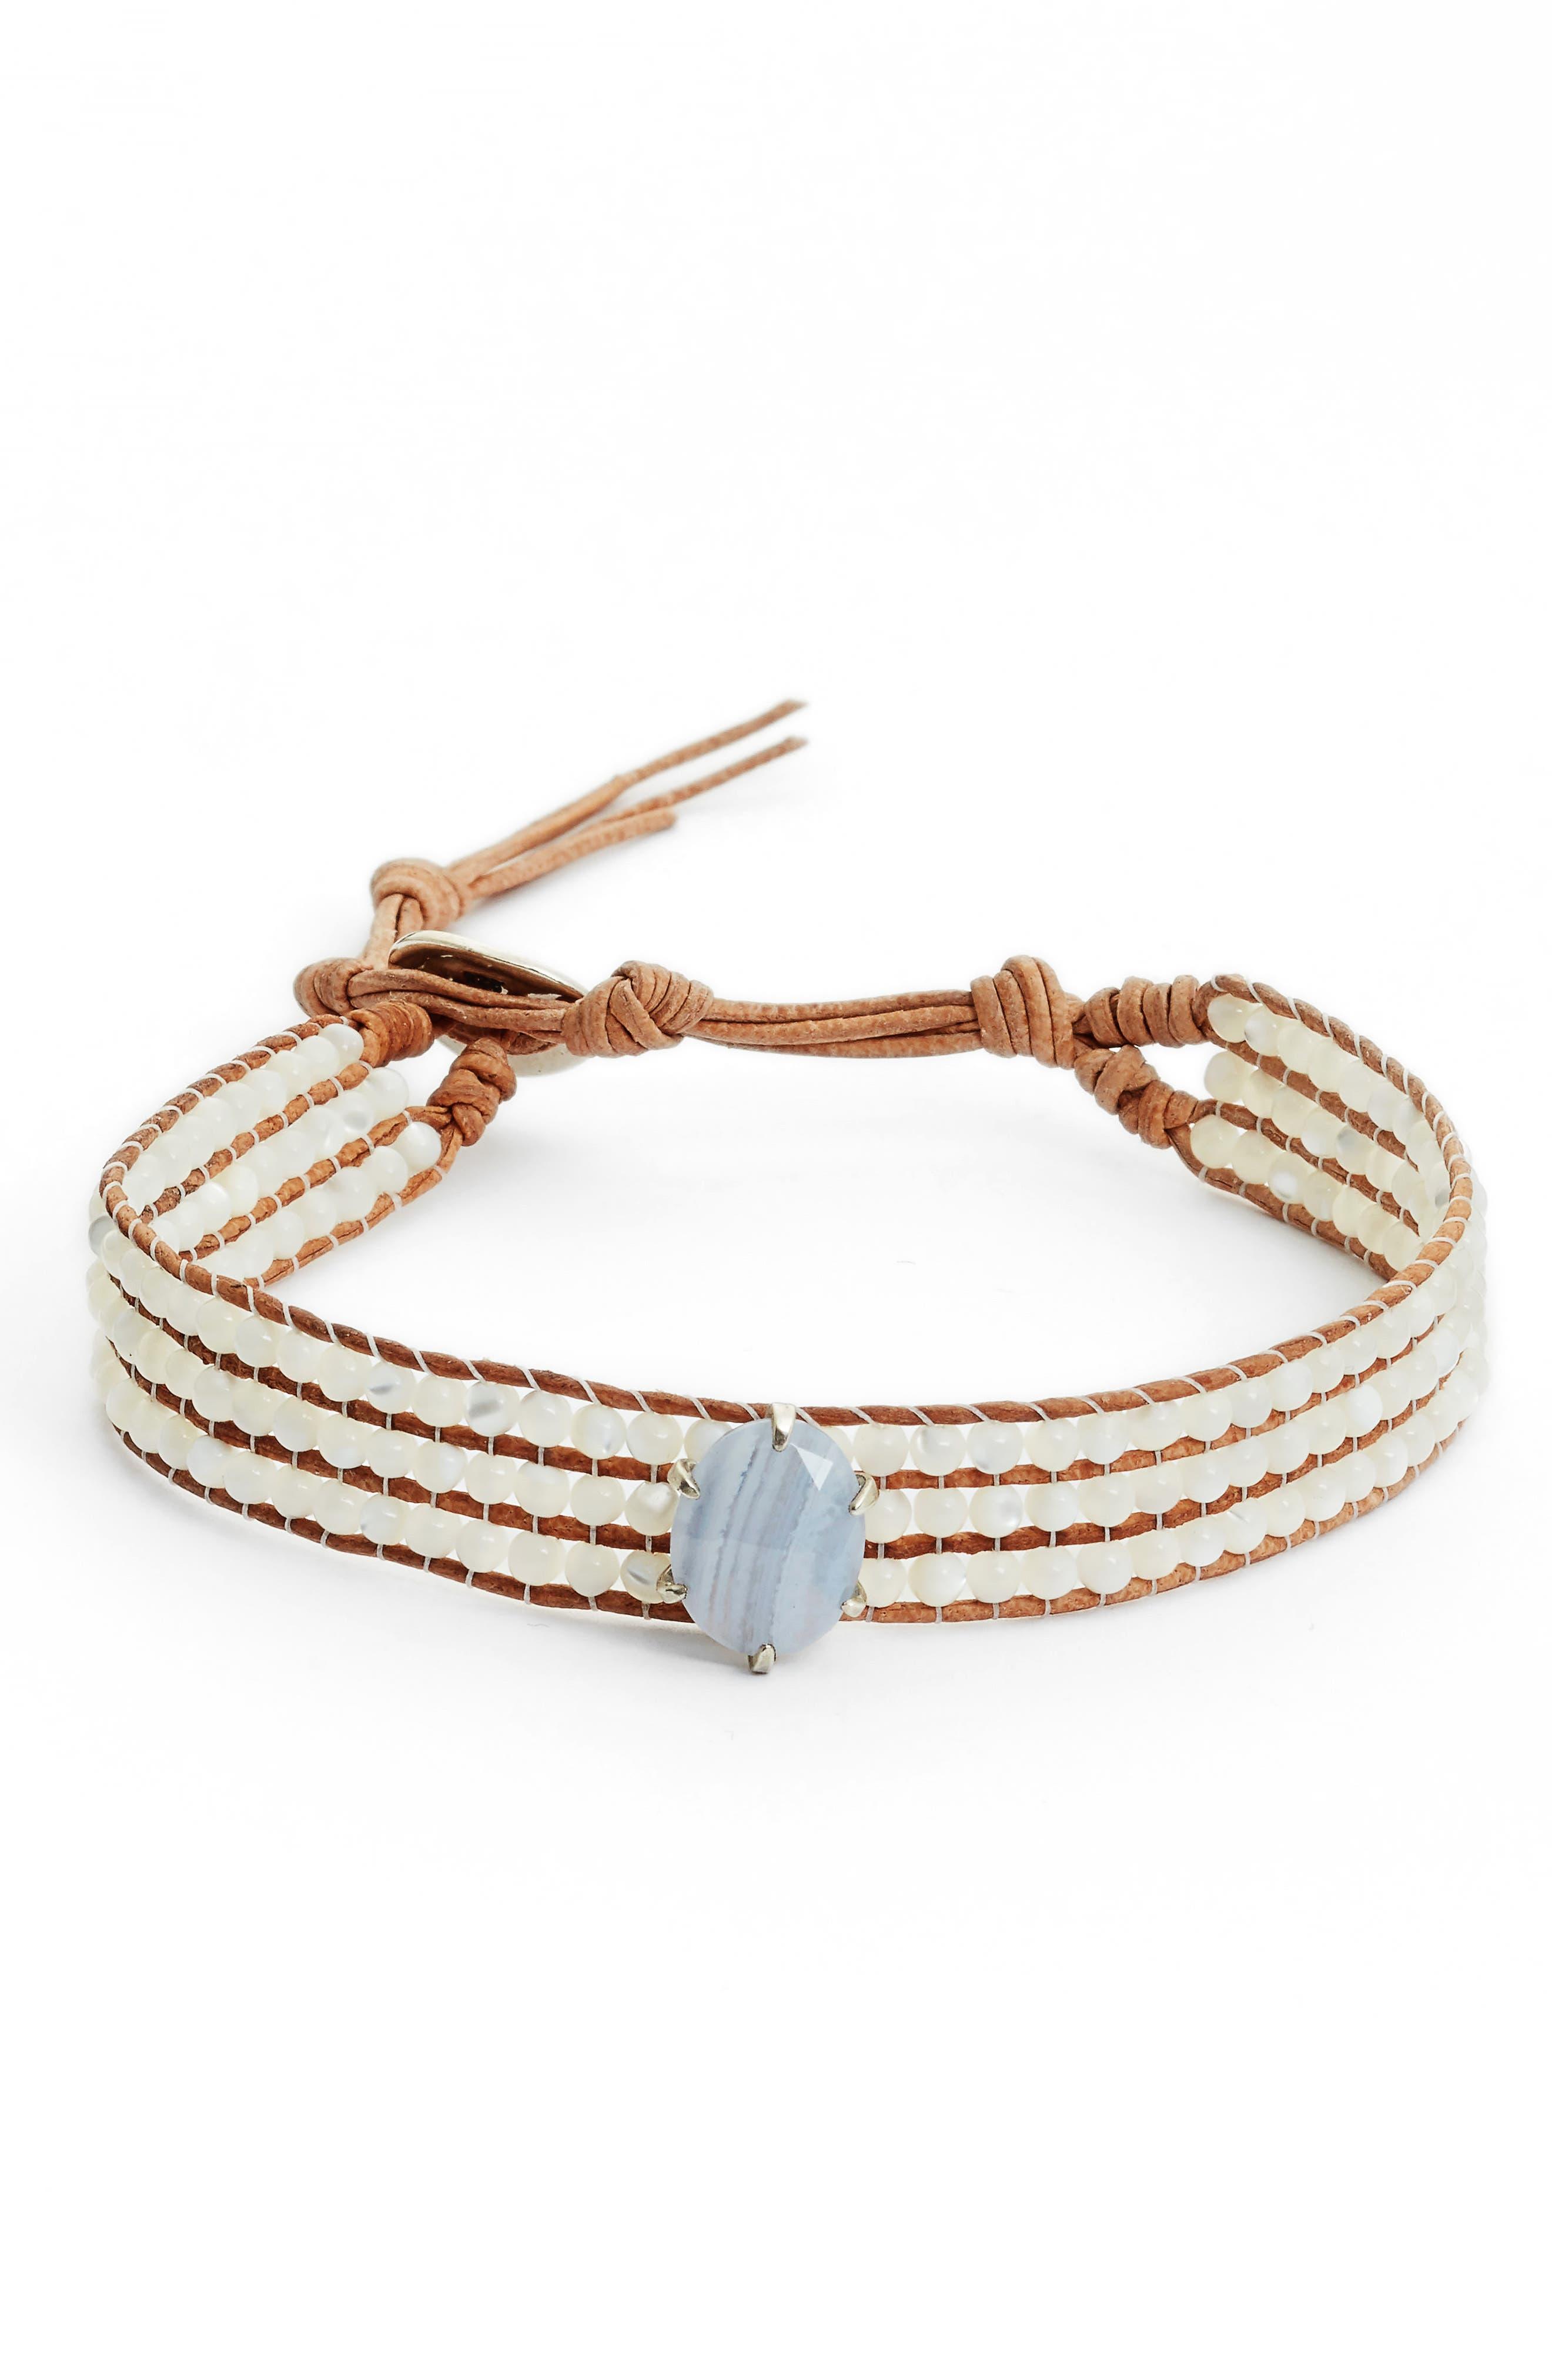 Semiprecious Stone Statement Bracelet,                             Main thumbnail 1, color,                             WHITE MOP MIX